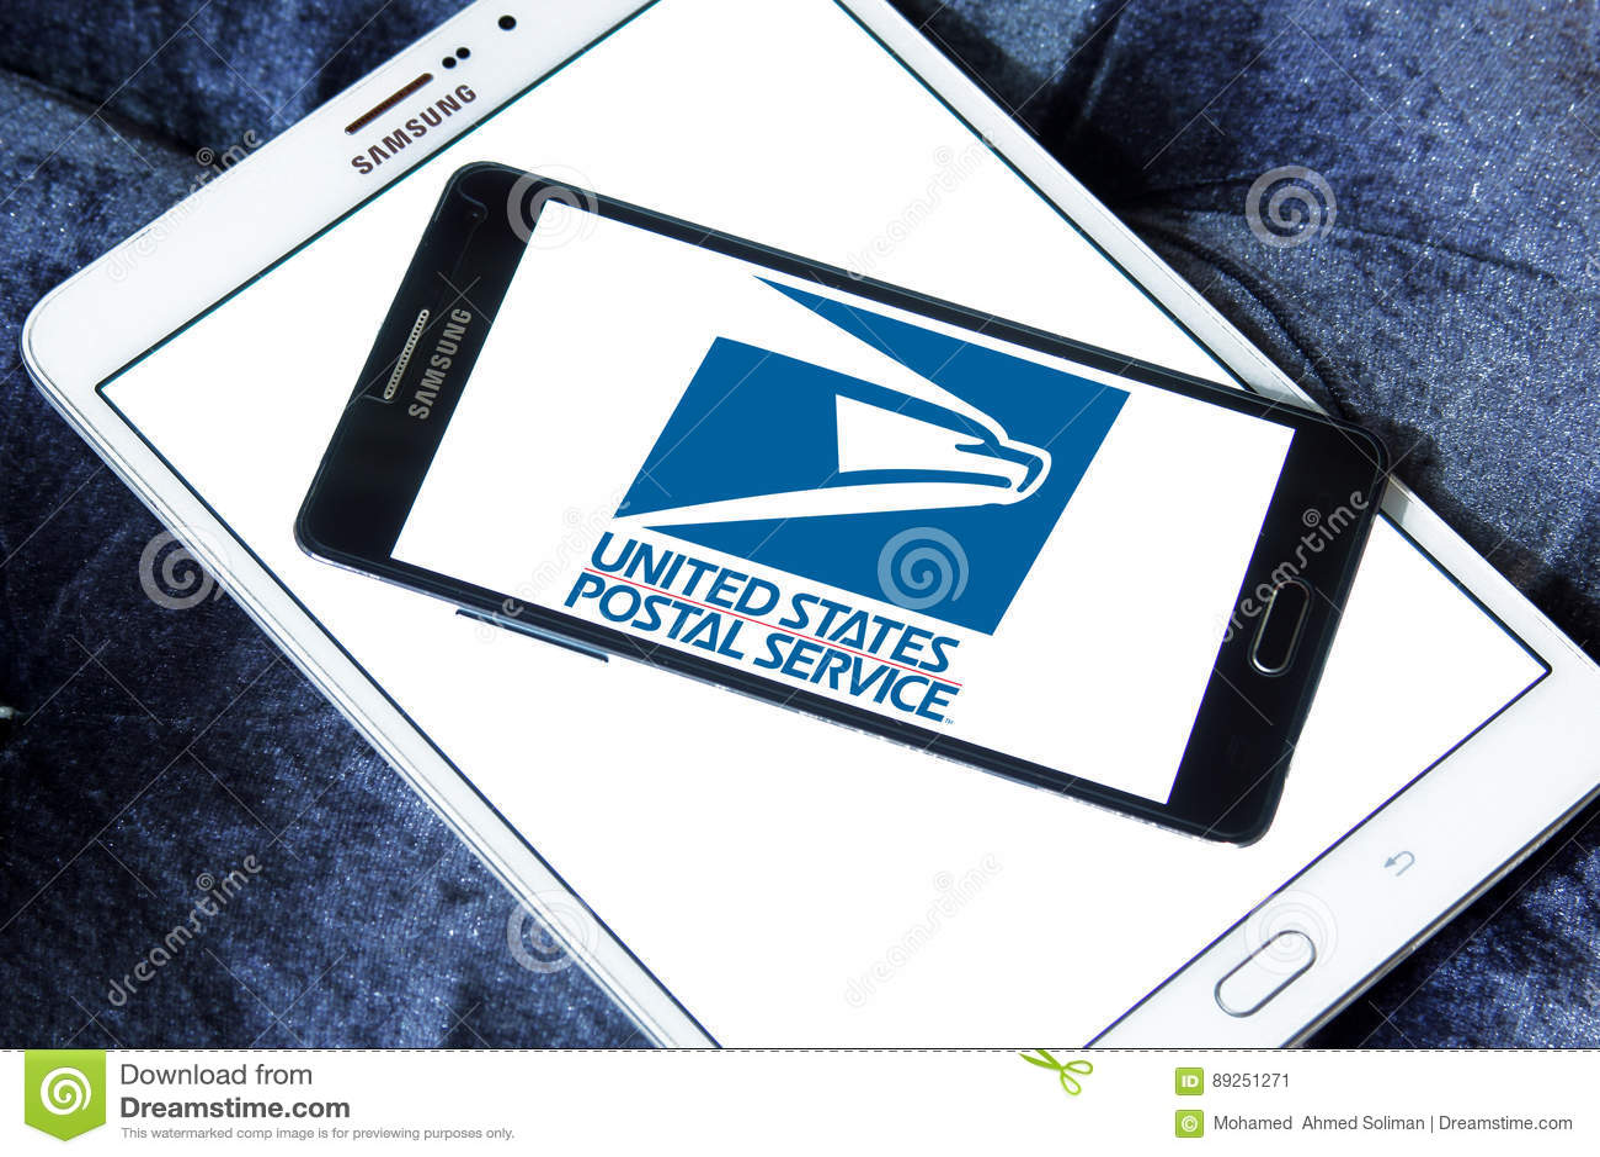 United states postal service logo editorial photo image of logo united states postal service logo buycottarizona